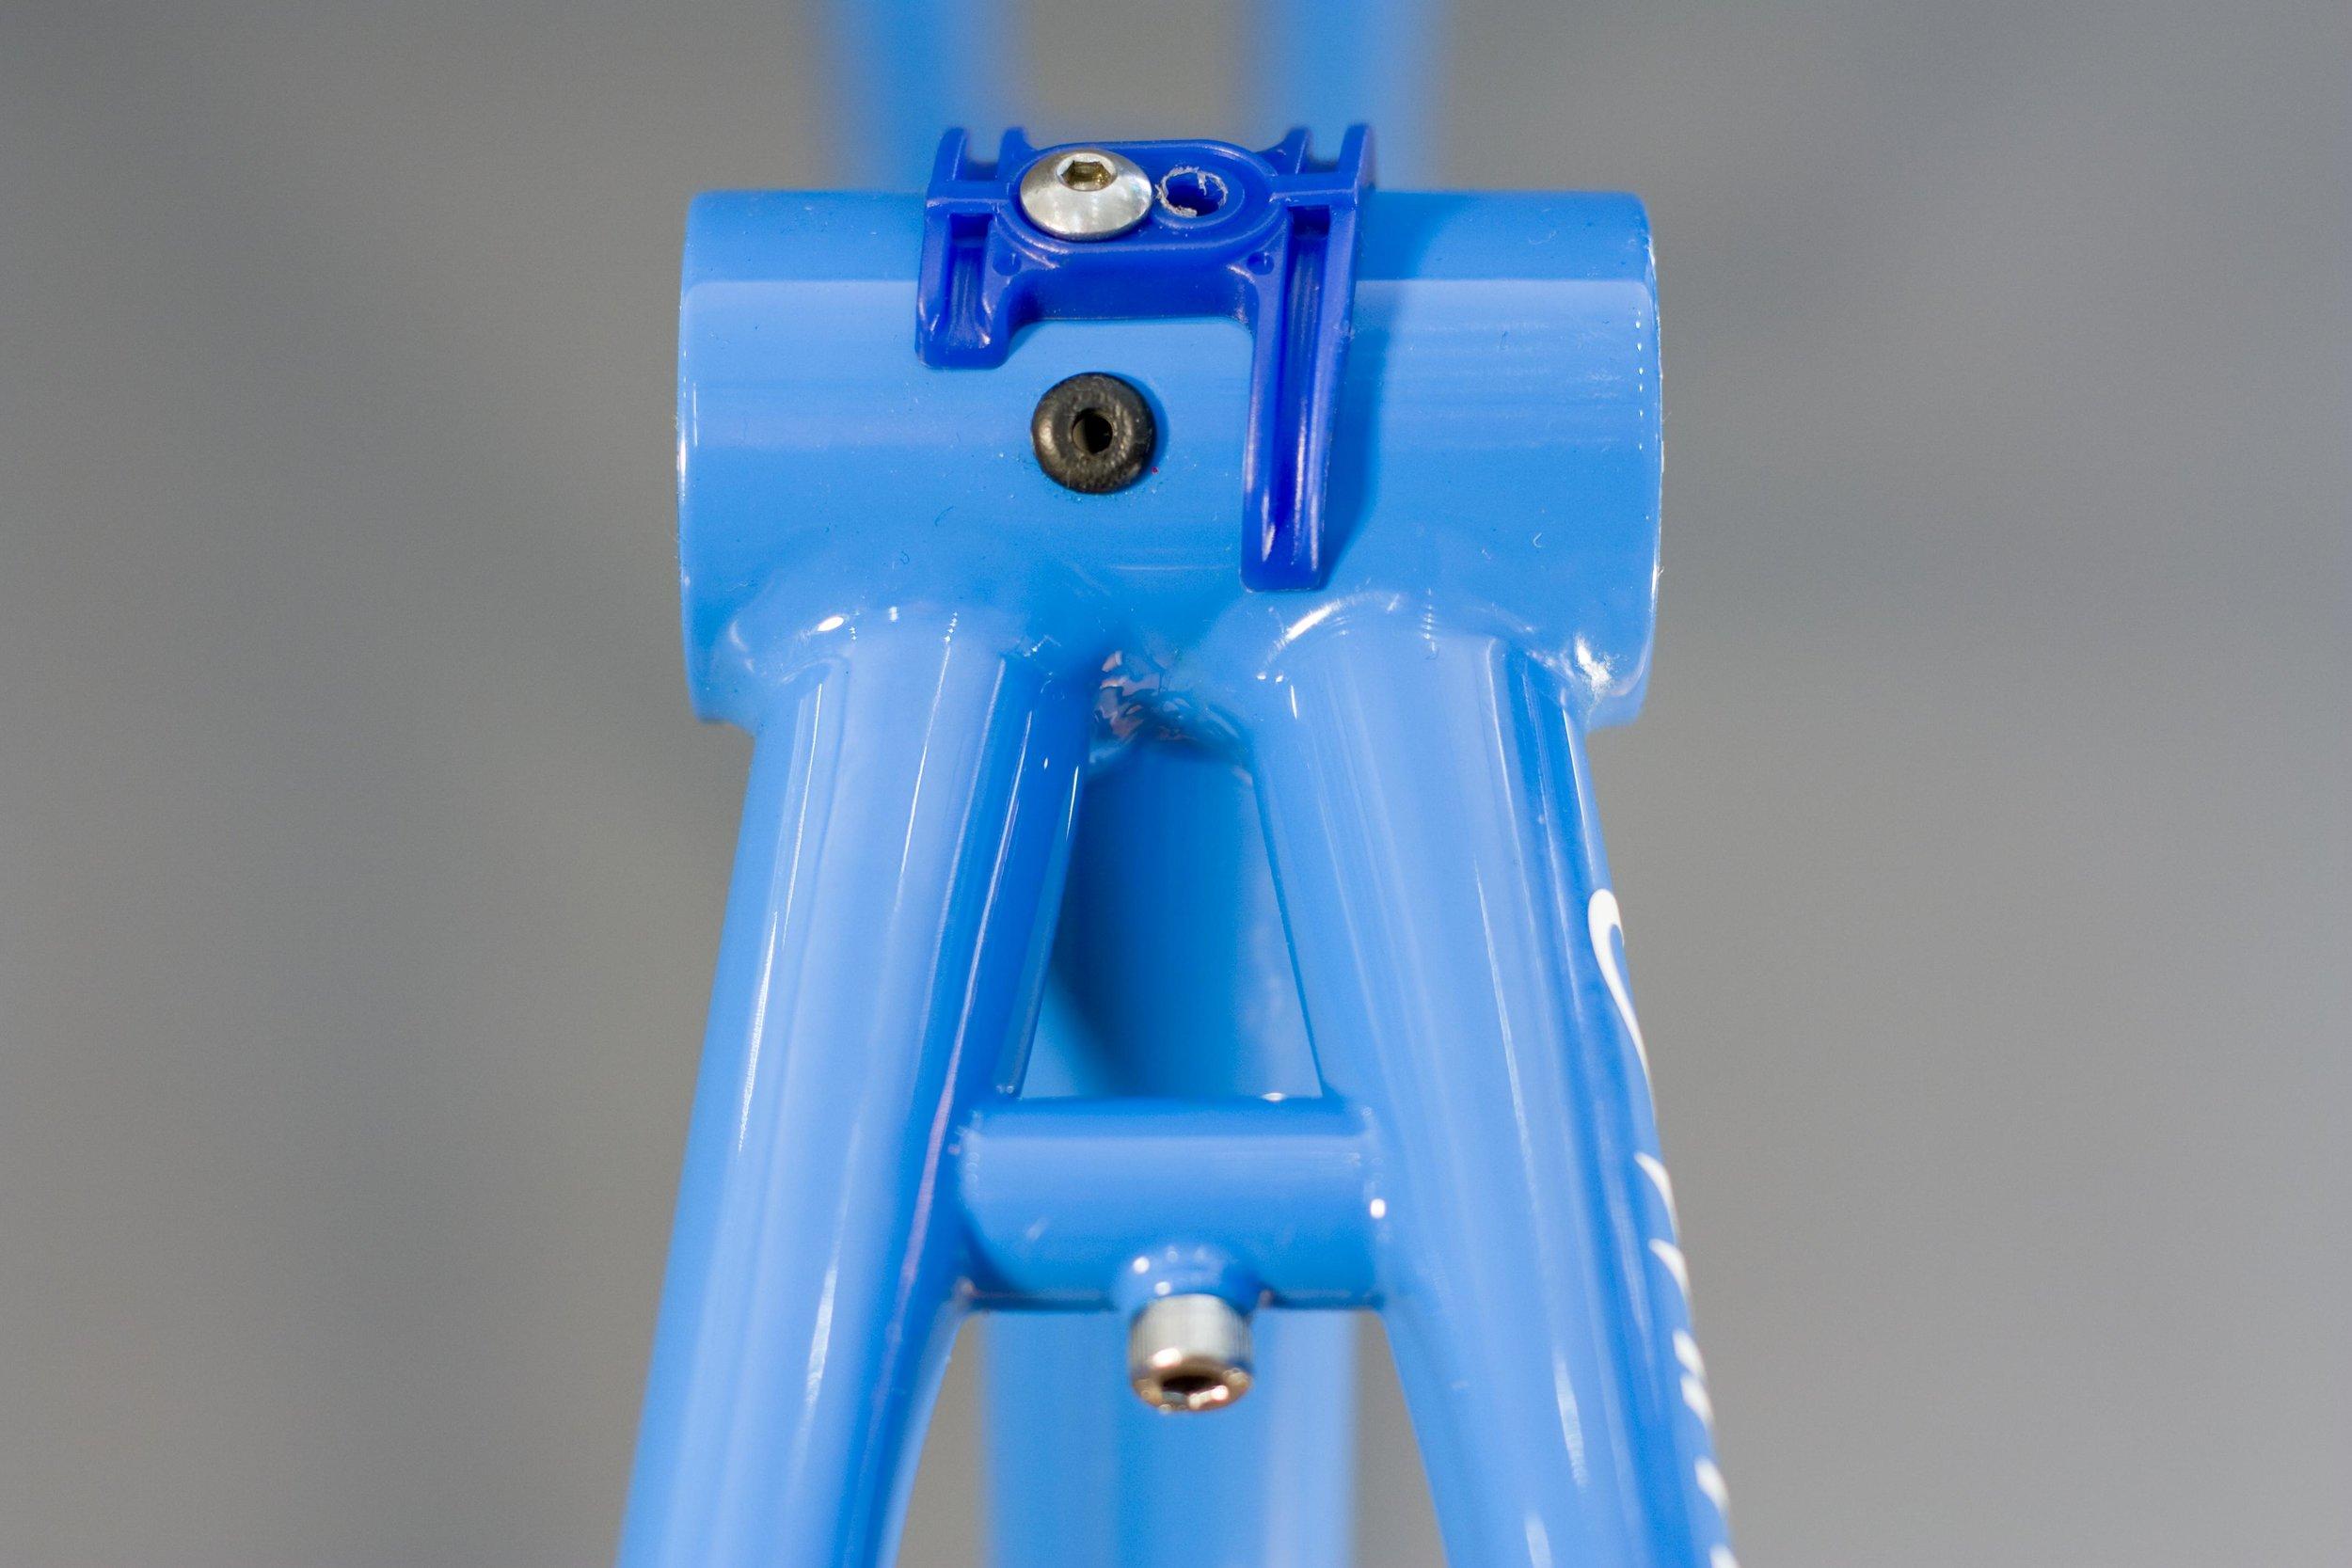 56cm-winter-bicycles-built-pelican_8270929364_o.jpg